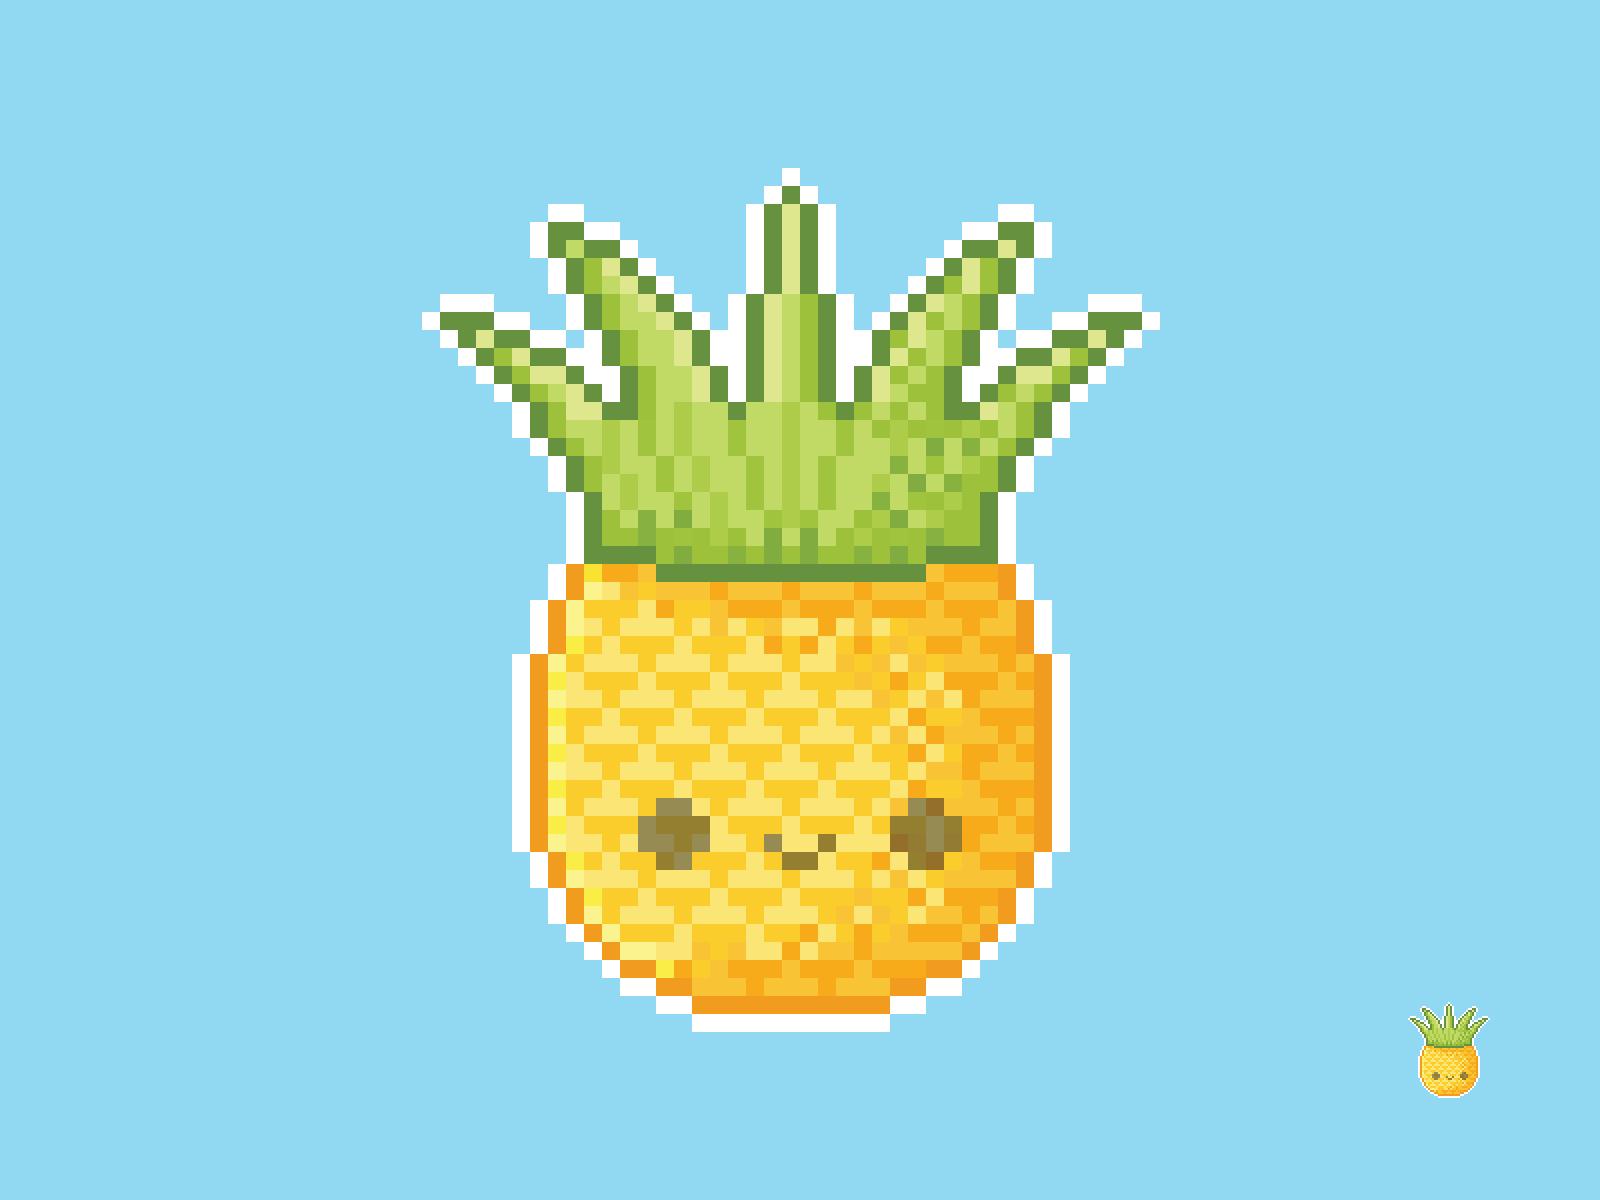 Cute Kawaii Pineapple Pixel